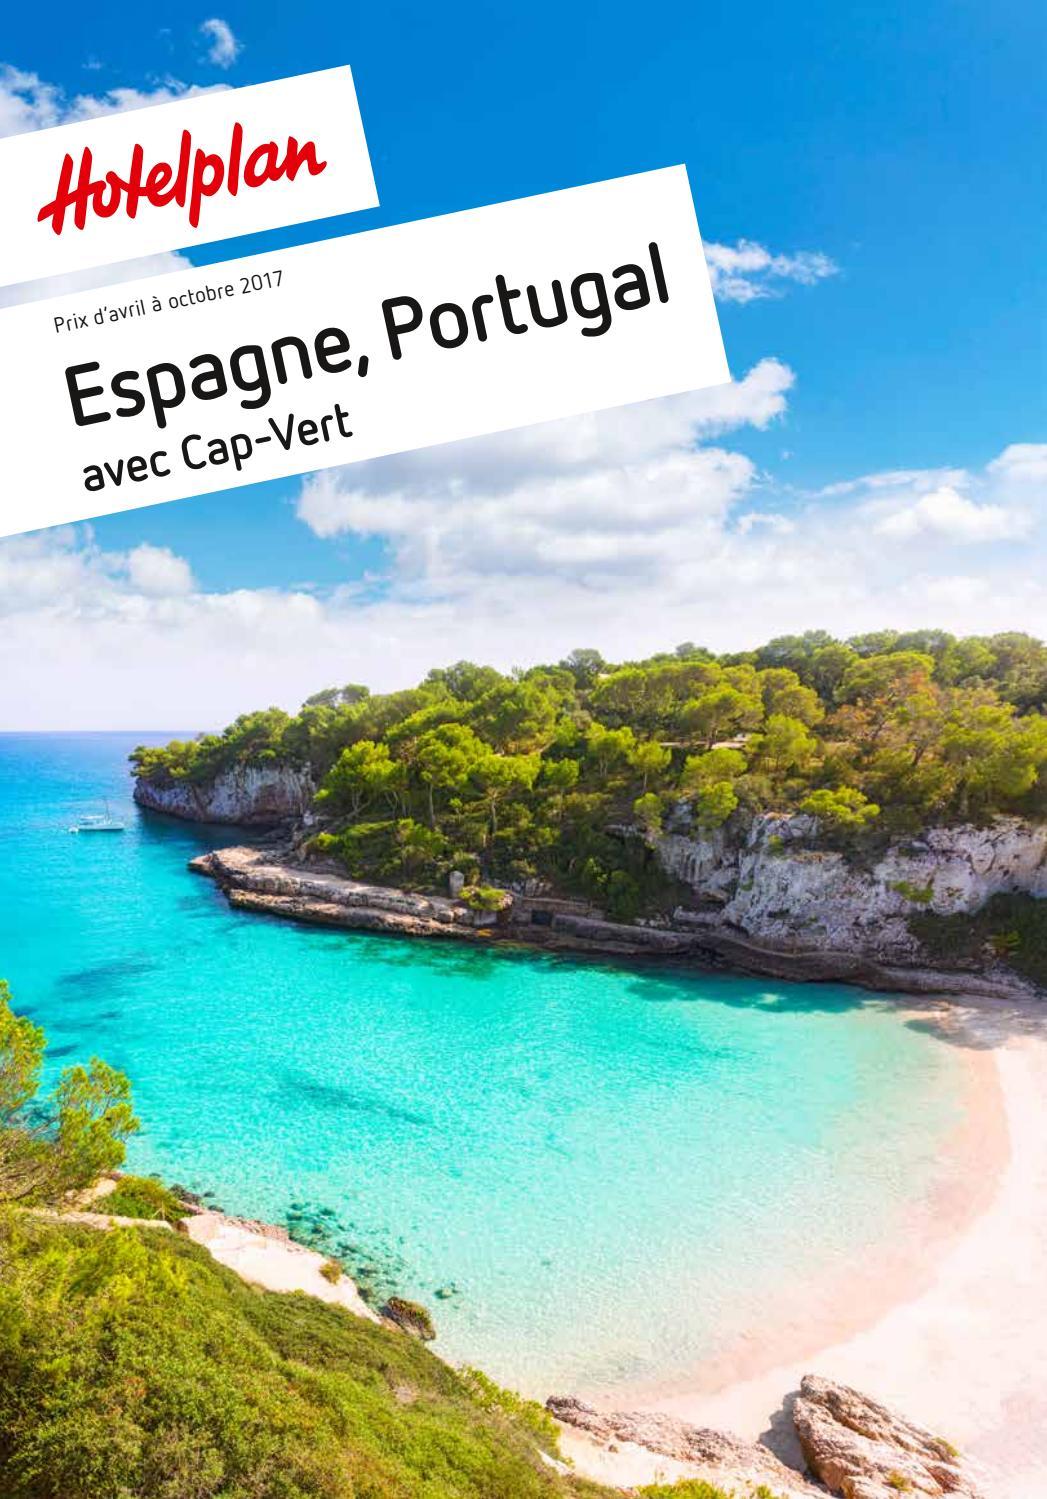 liste de prix hotelplan espagne portugal d 39 avril octobre 2017 by hotelplan suisse mtch ag. Black Bedroom Furniture Sets. Home Design Ideas